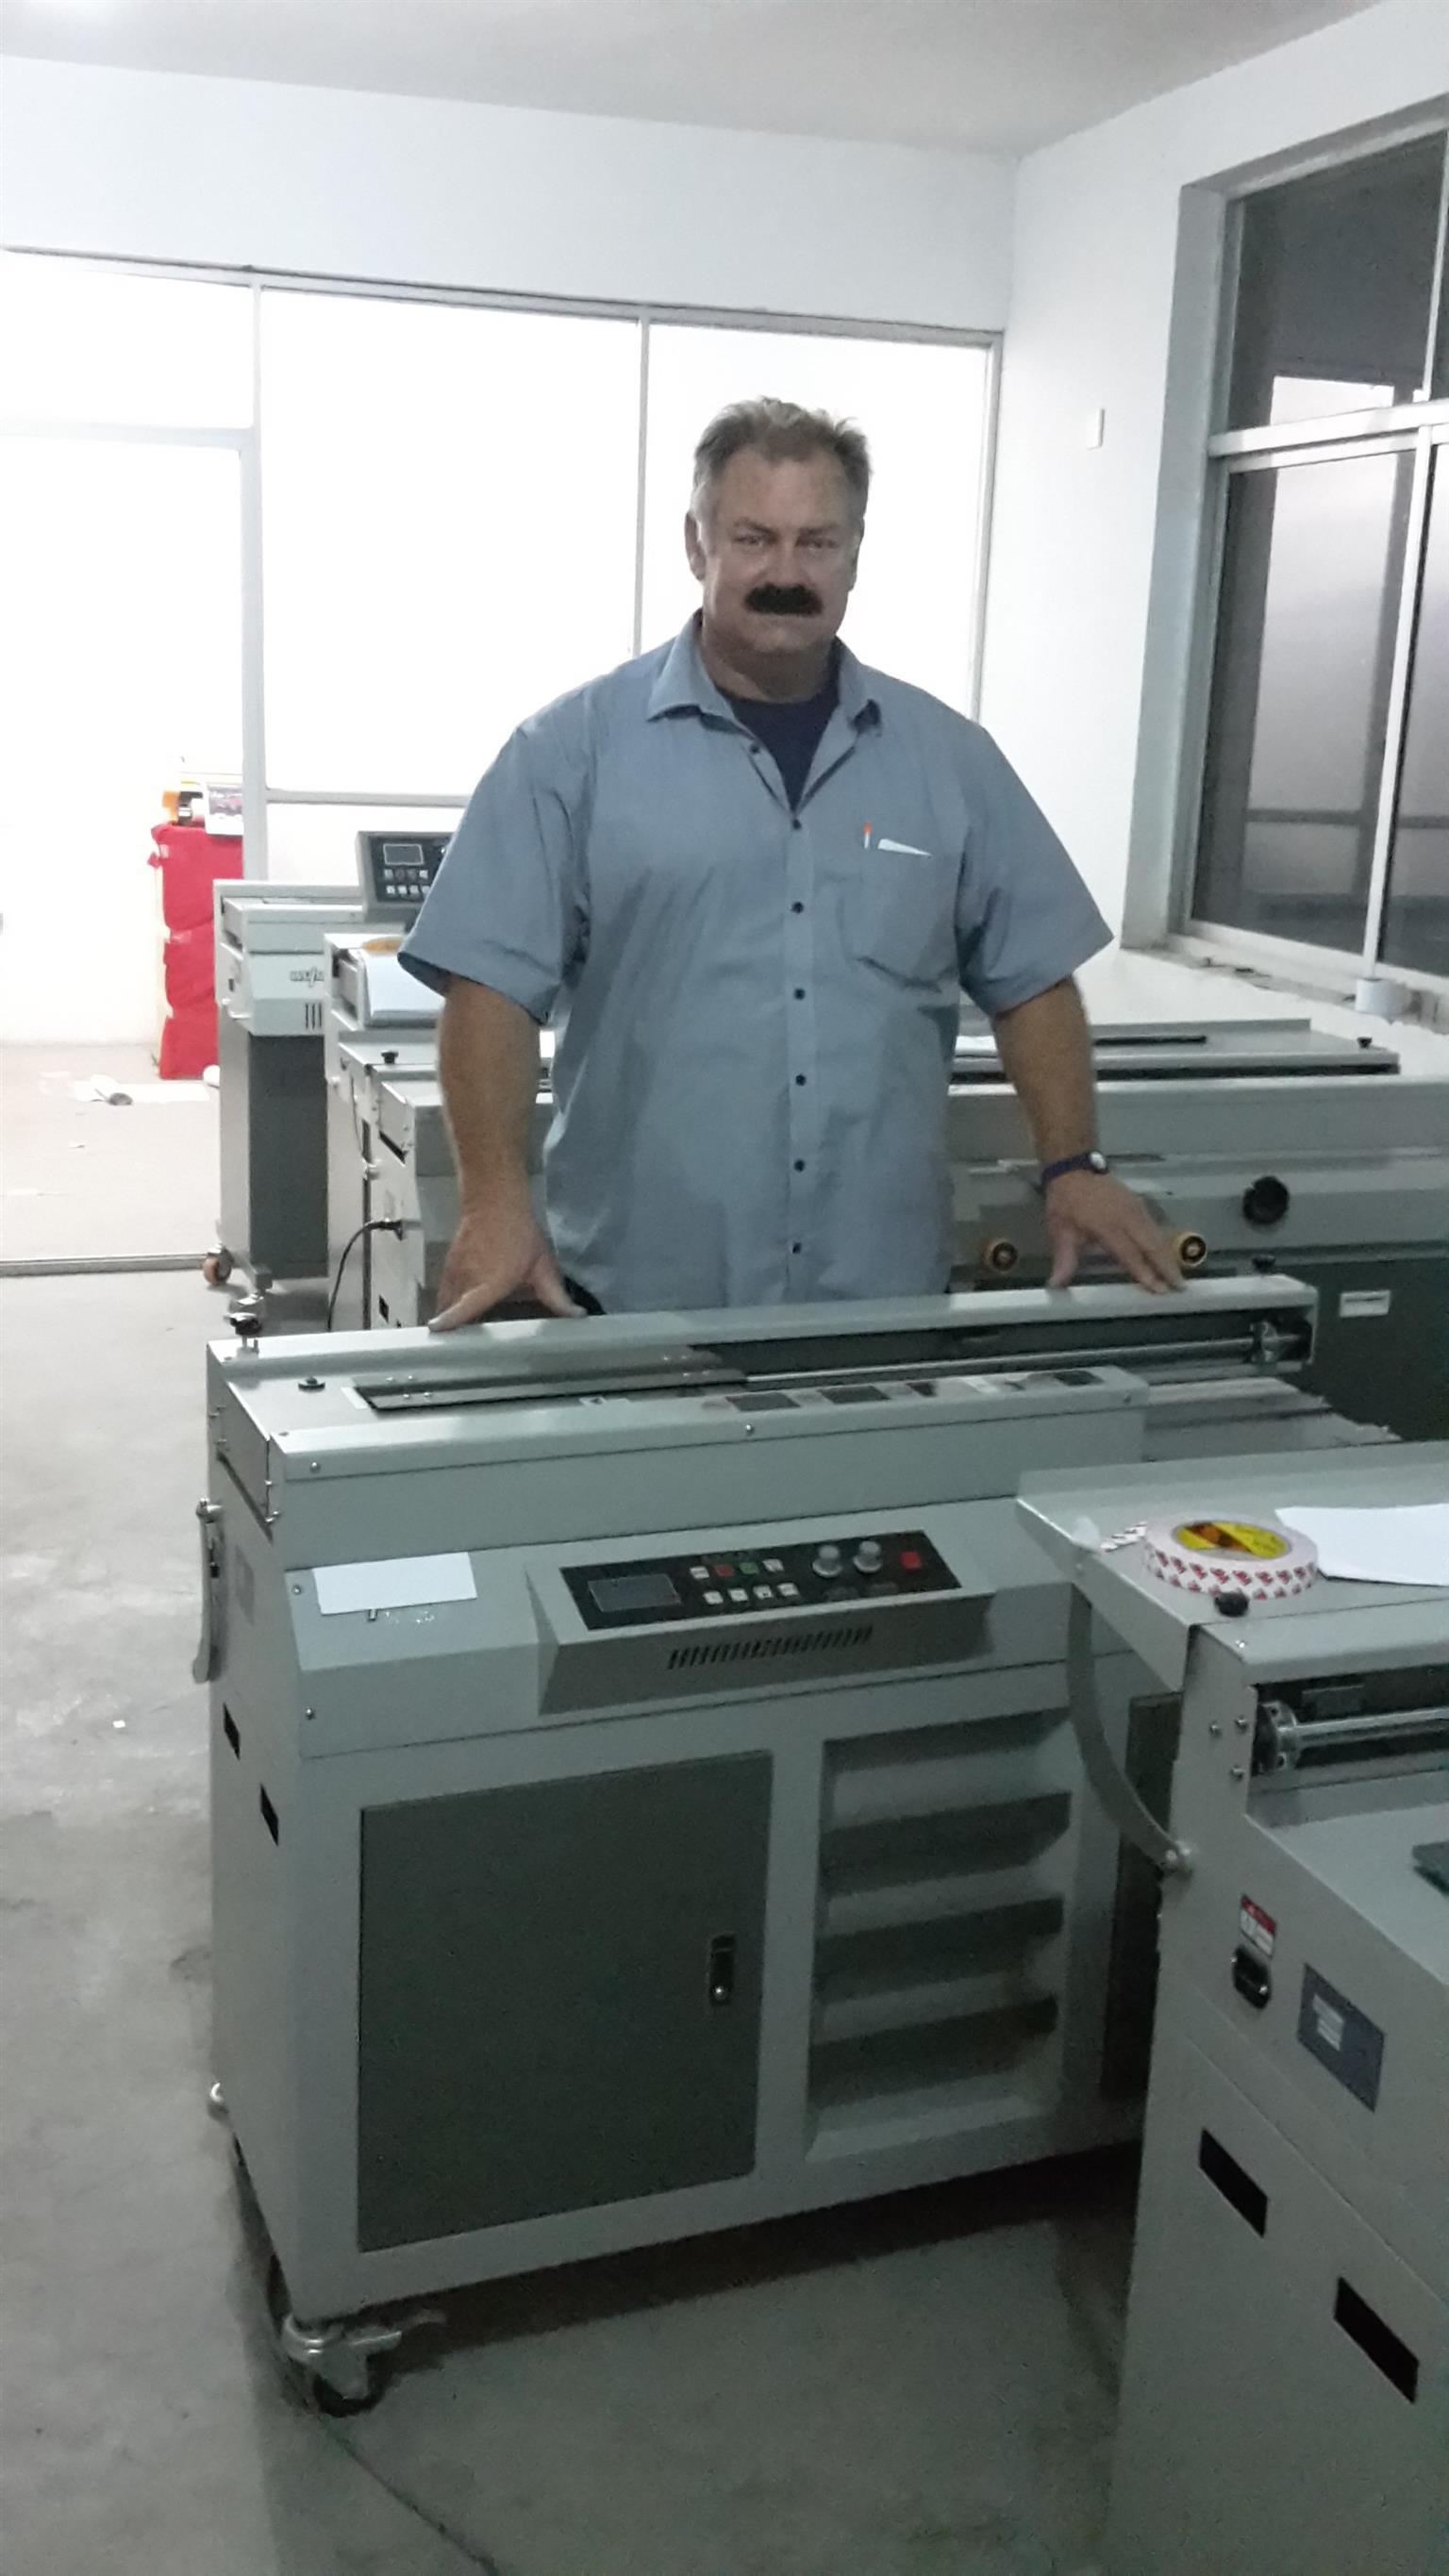 Printing Finishing Equipment NEW,@ Bargain prices Guillotine, Perforating, Scoring, Paper drilling